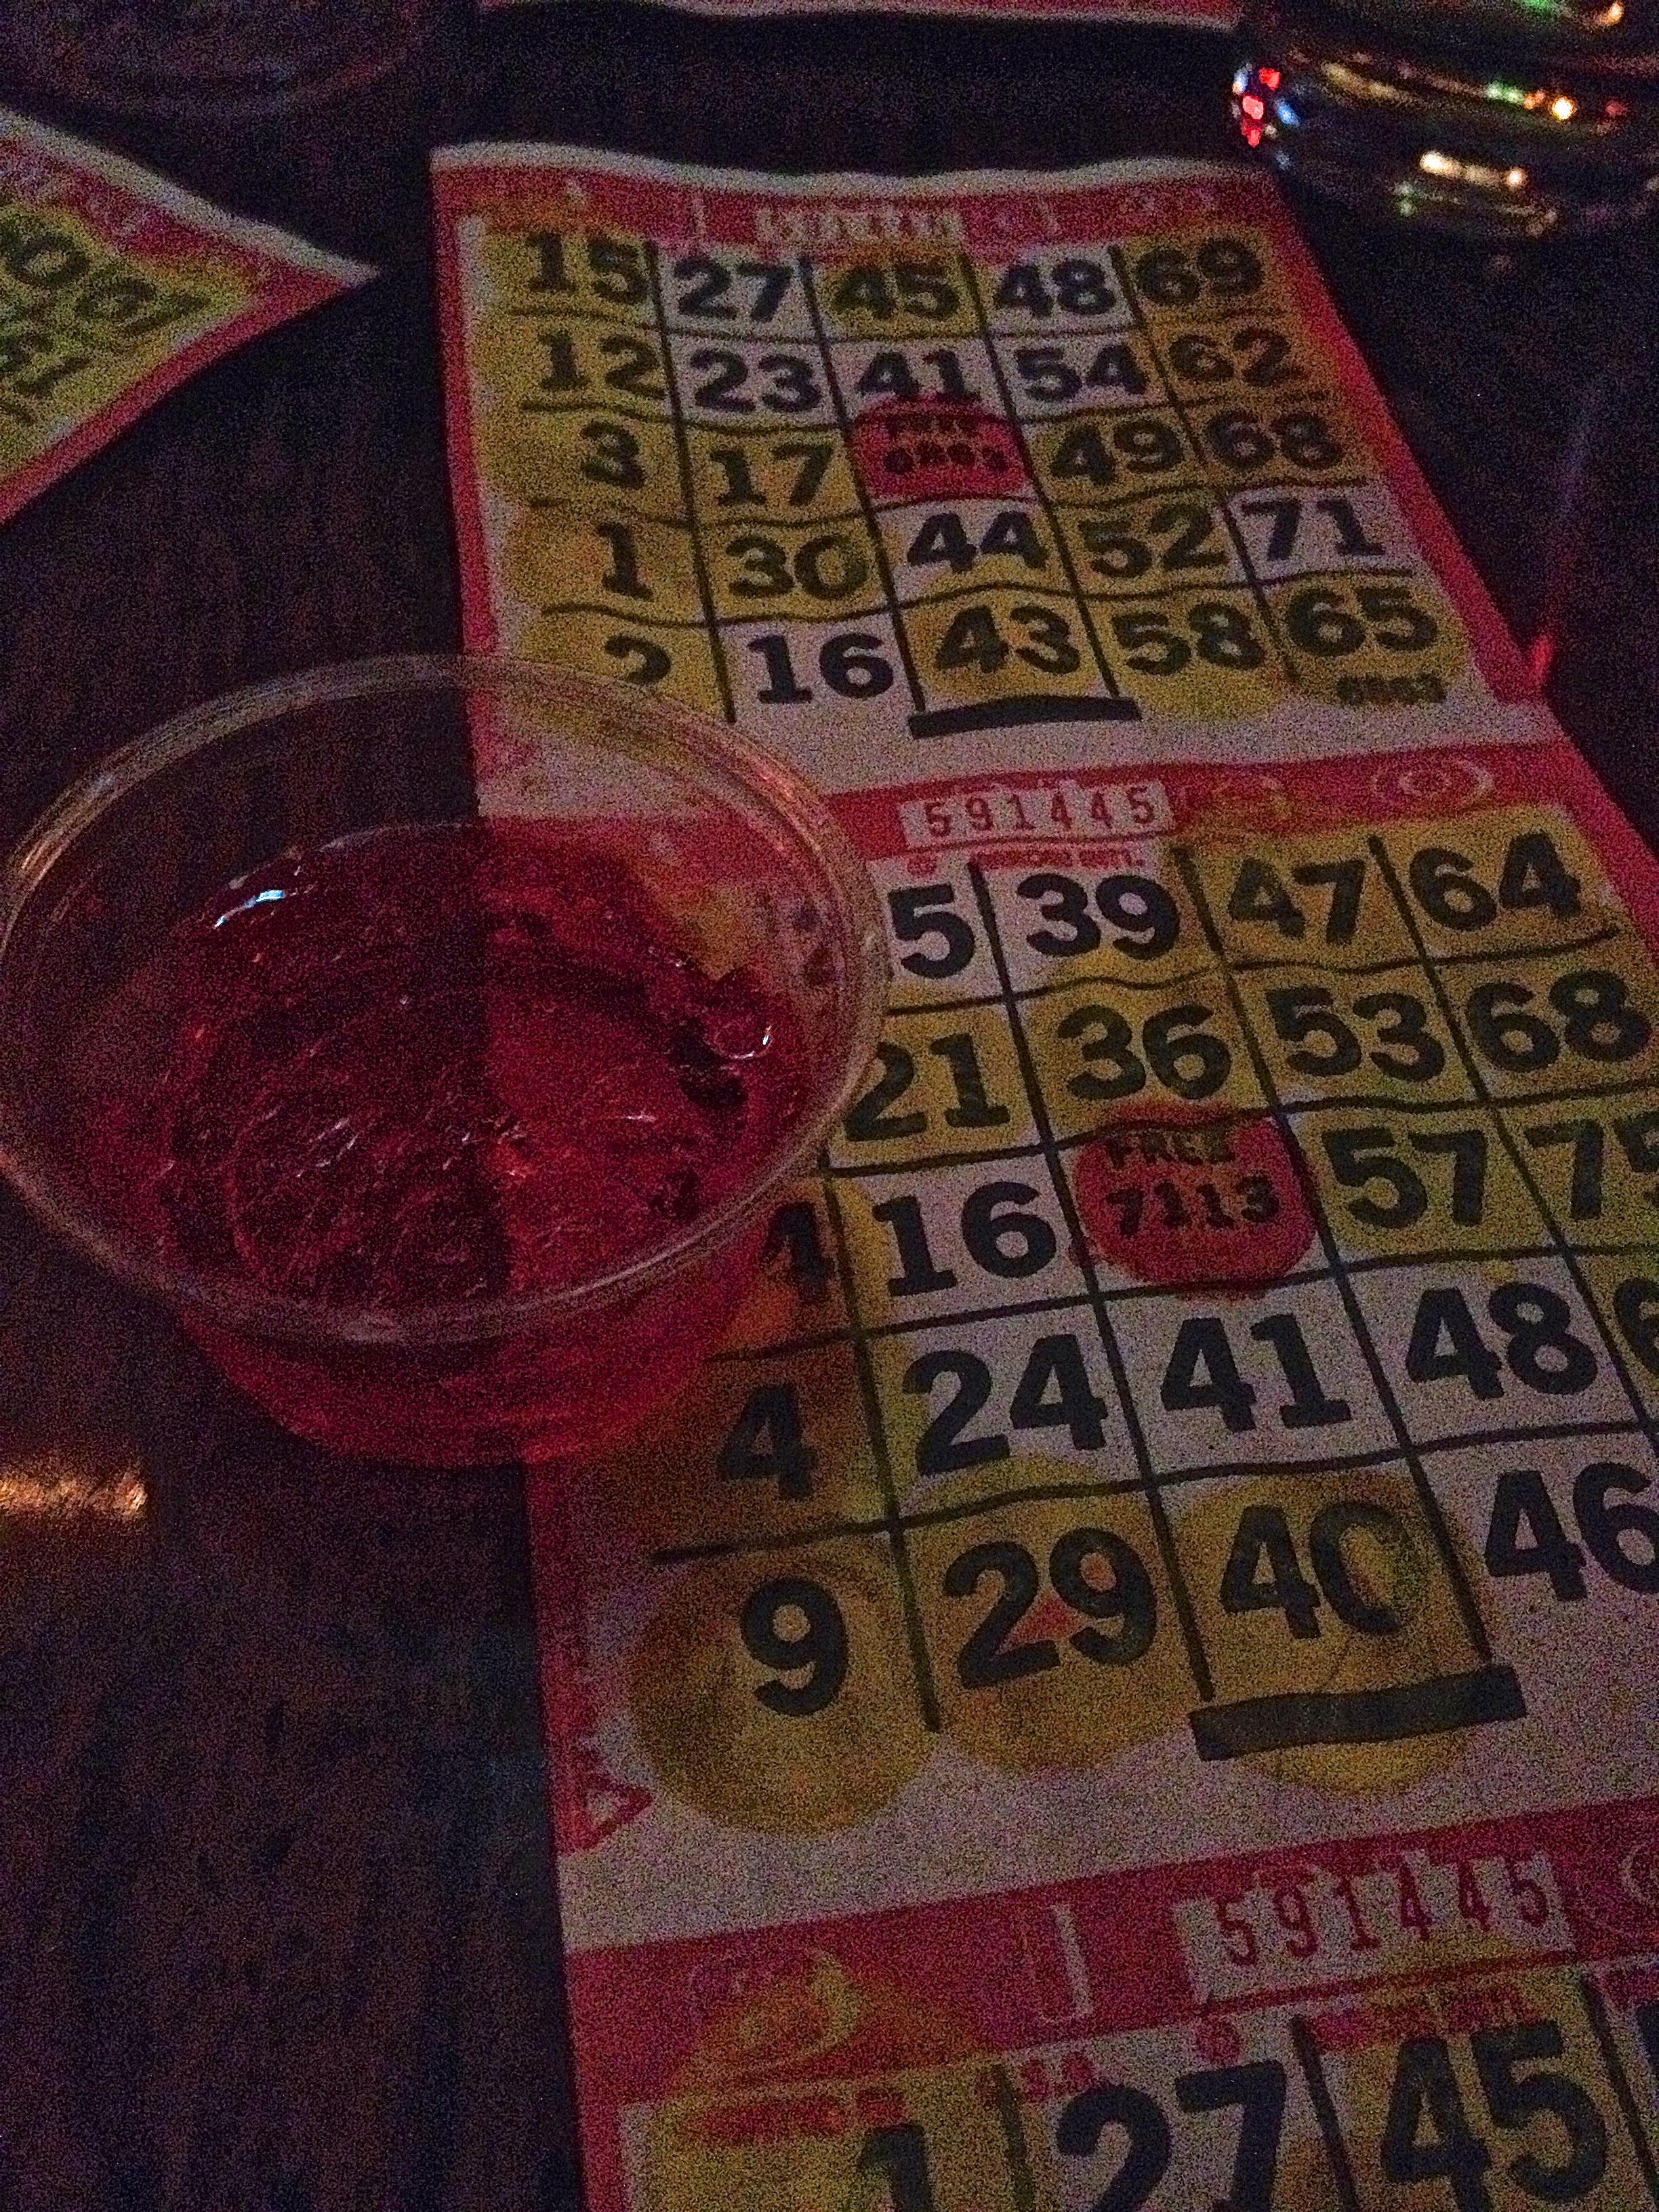 Saturday evening Bingo at Rip Tide!